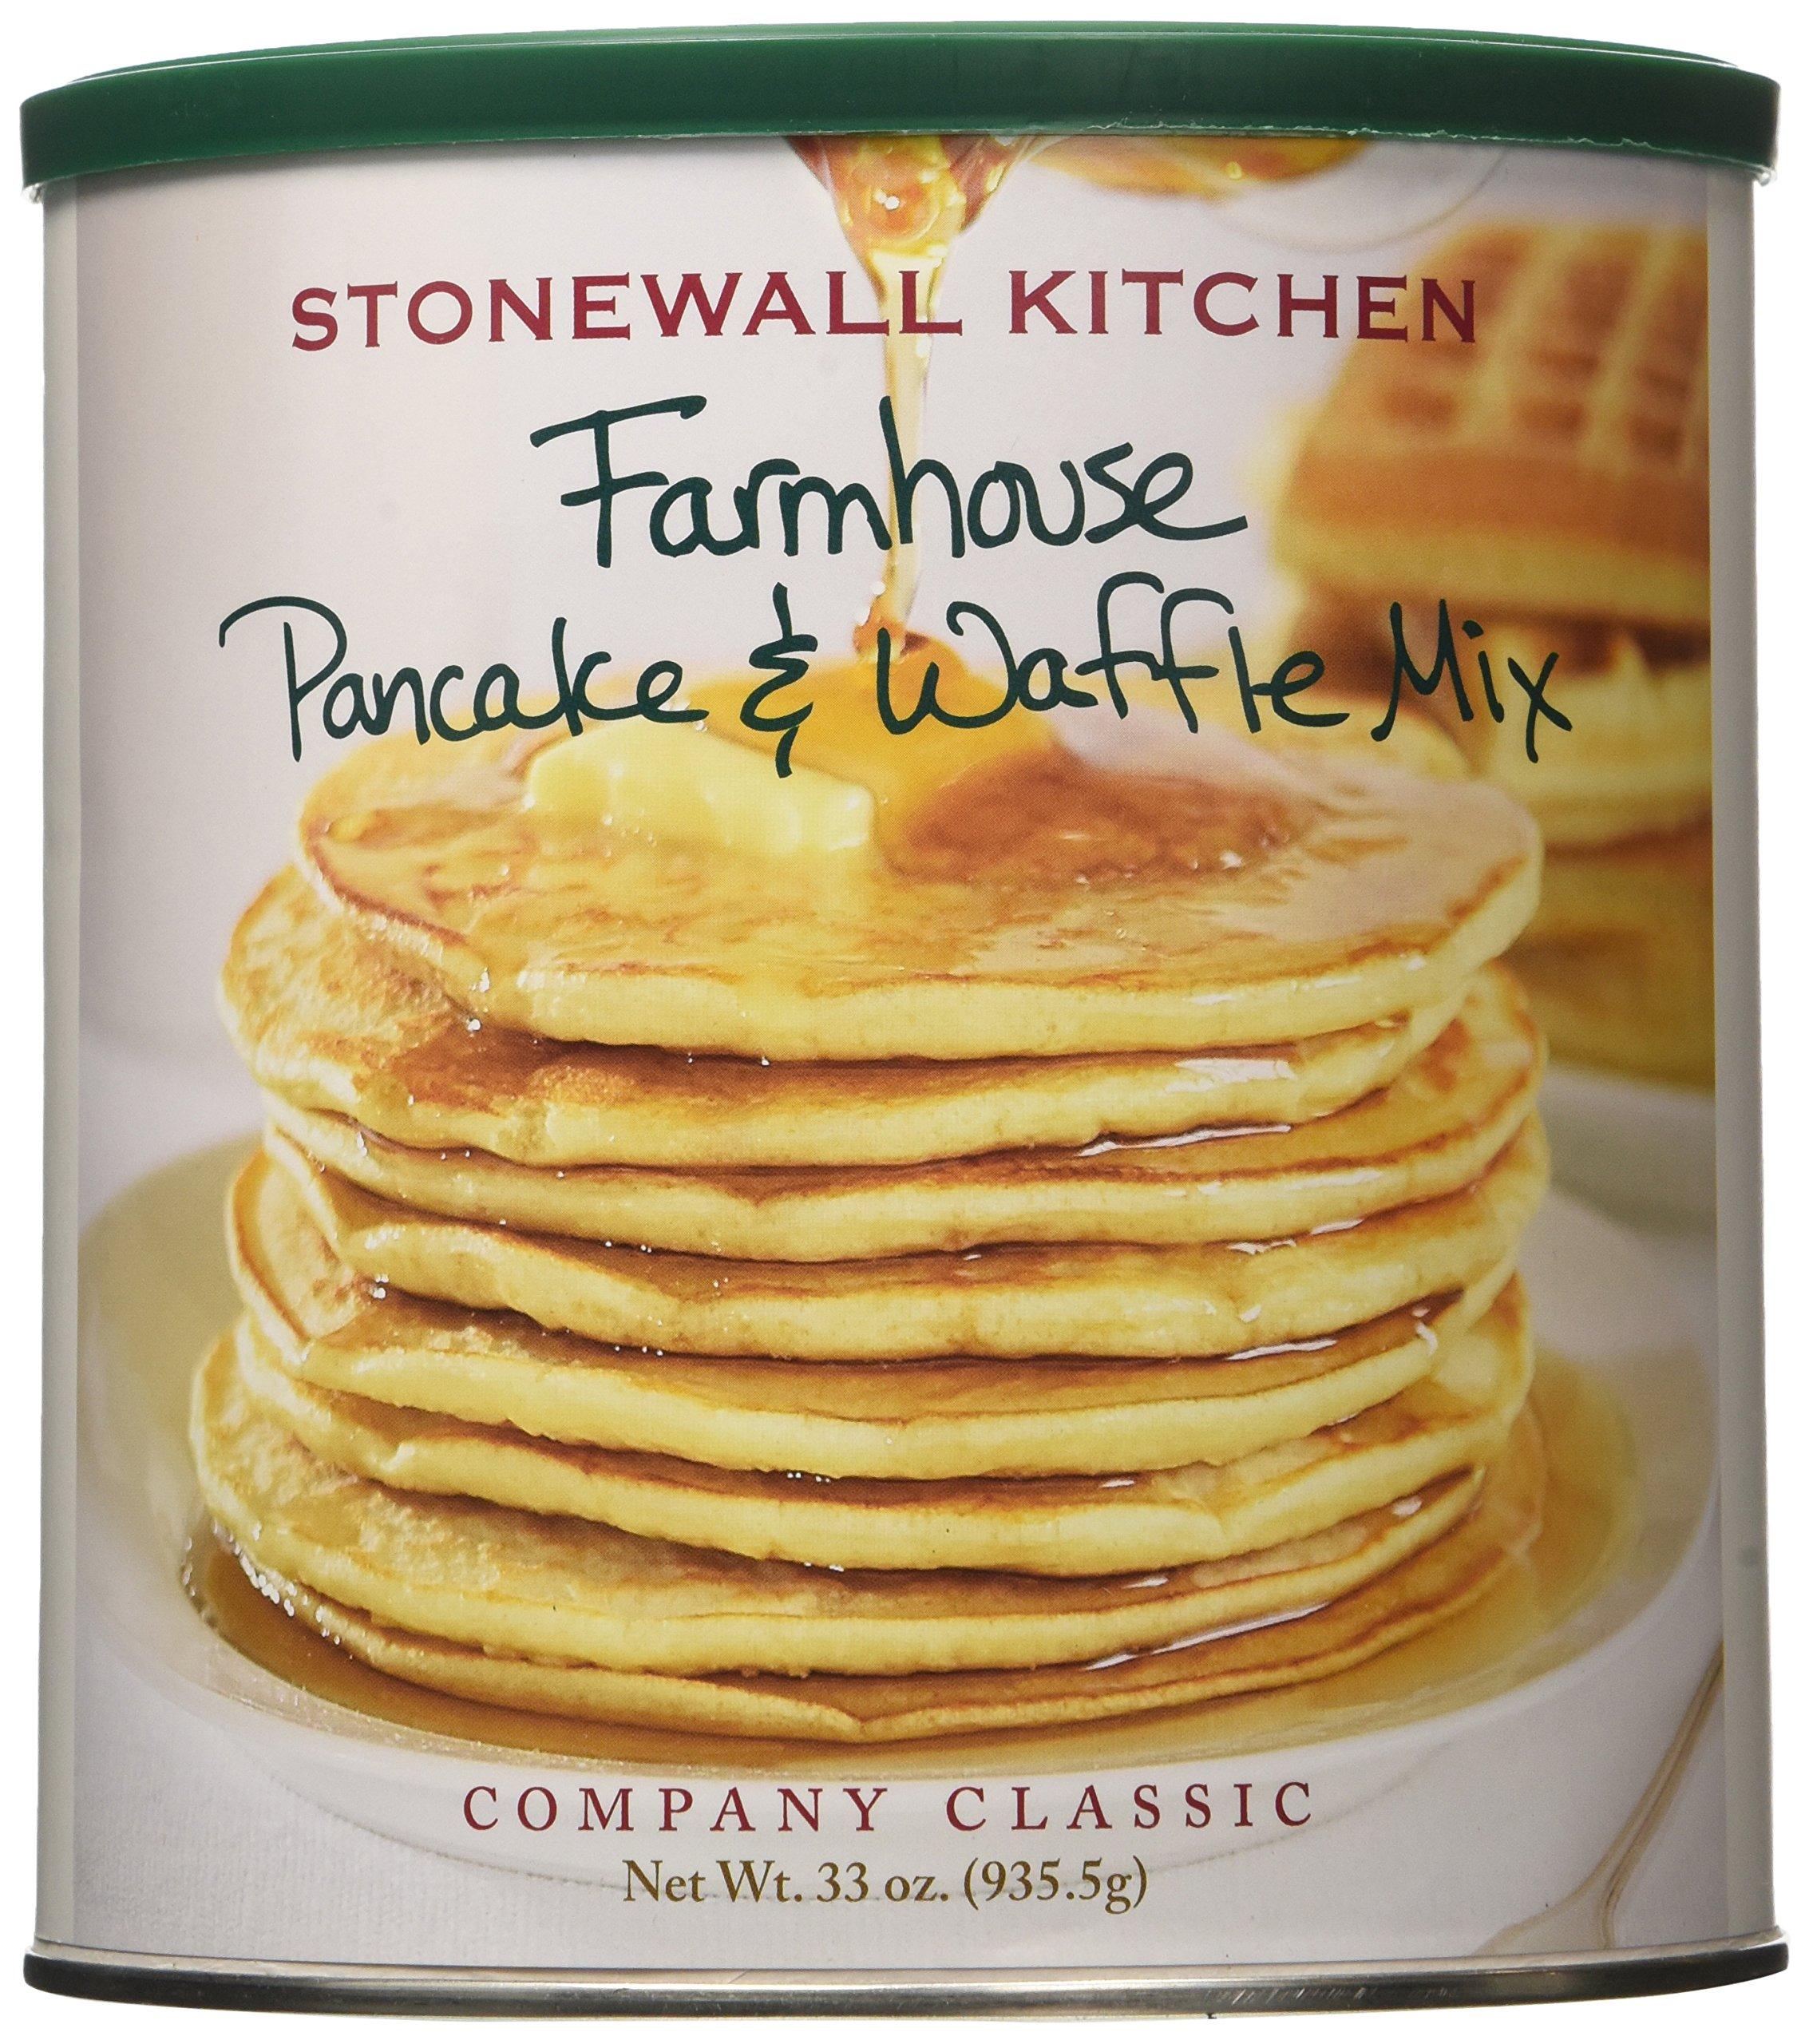 Stonewall Kitchen Farmhouse Pancake & Waffle Mix, 33 oz by Stonewall Kitchen (Image #2)